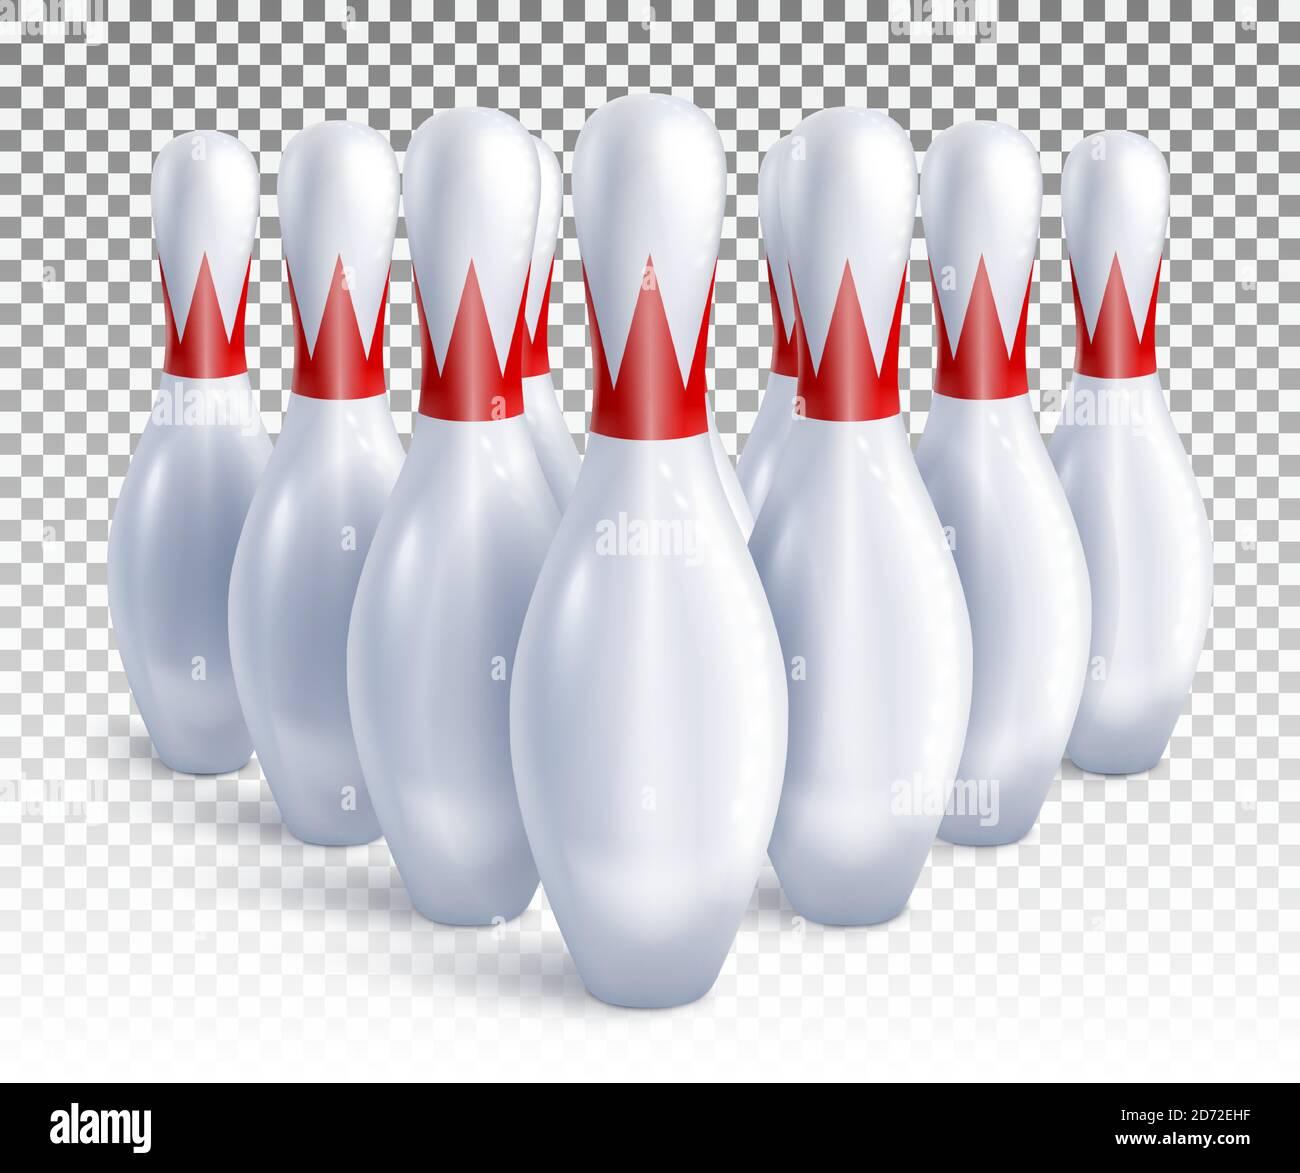 Ten Pin Bowling Score Stock Vektorgrafiken kaufen   Alamy